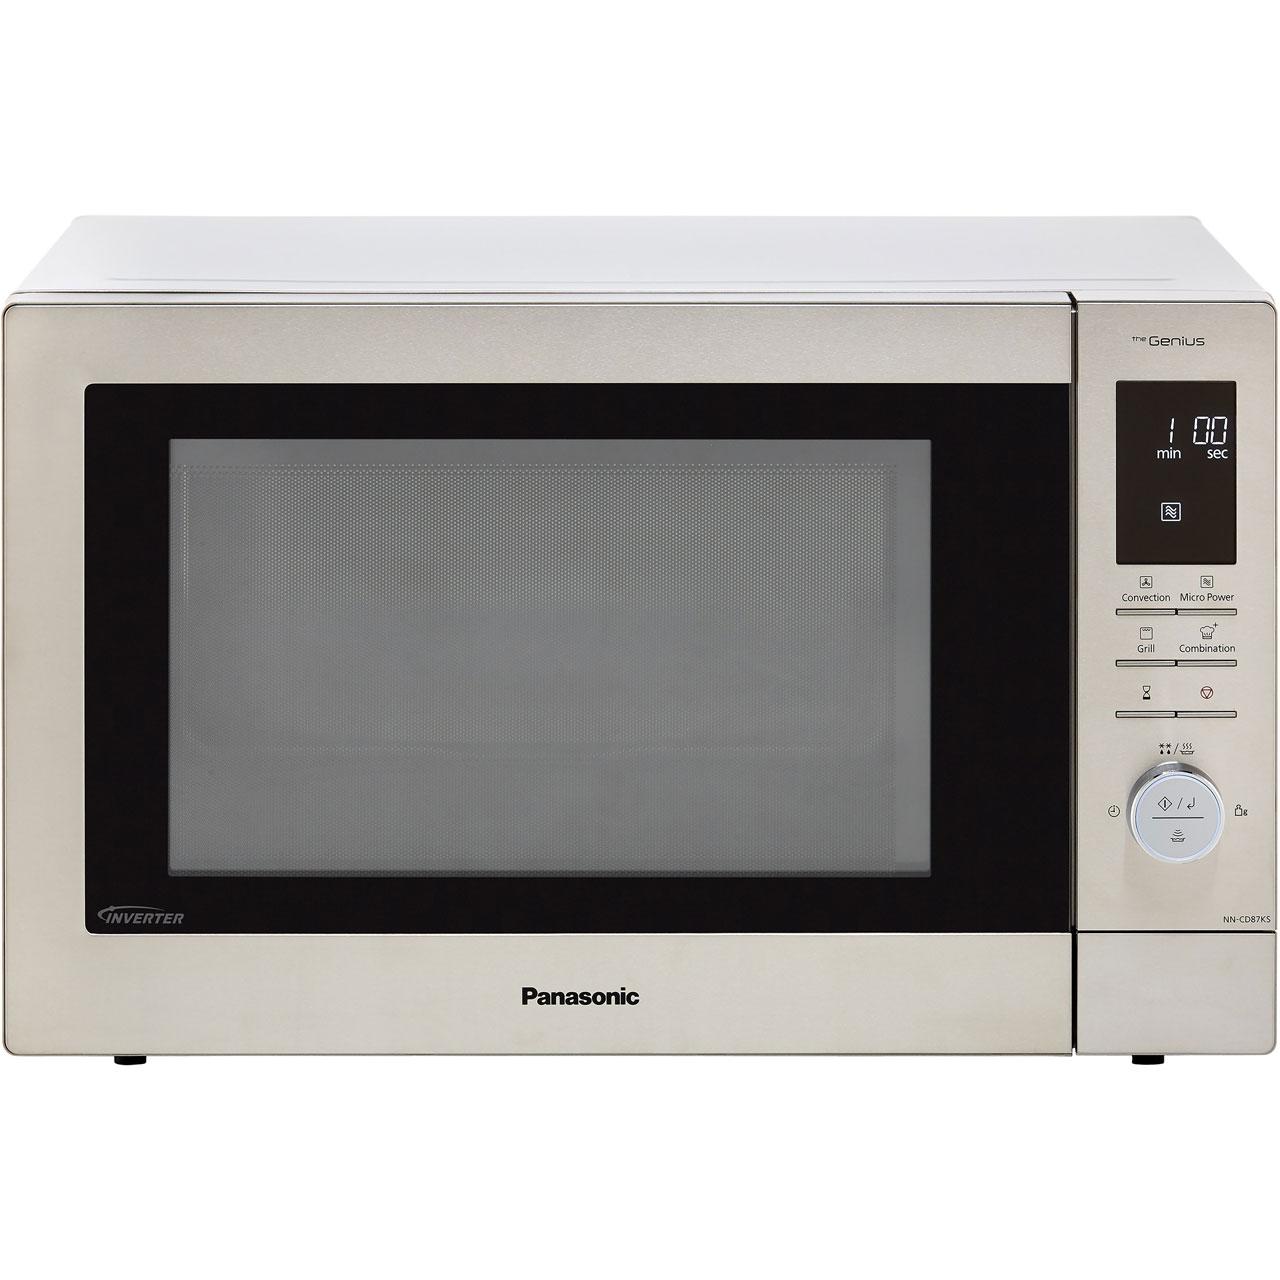 Panasonic Nn Cd87ksbpq 34 Litre Combination Microwave Oven Stainless Steel Ss